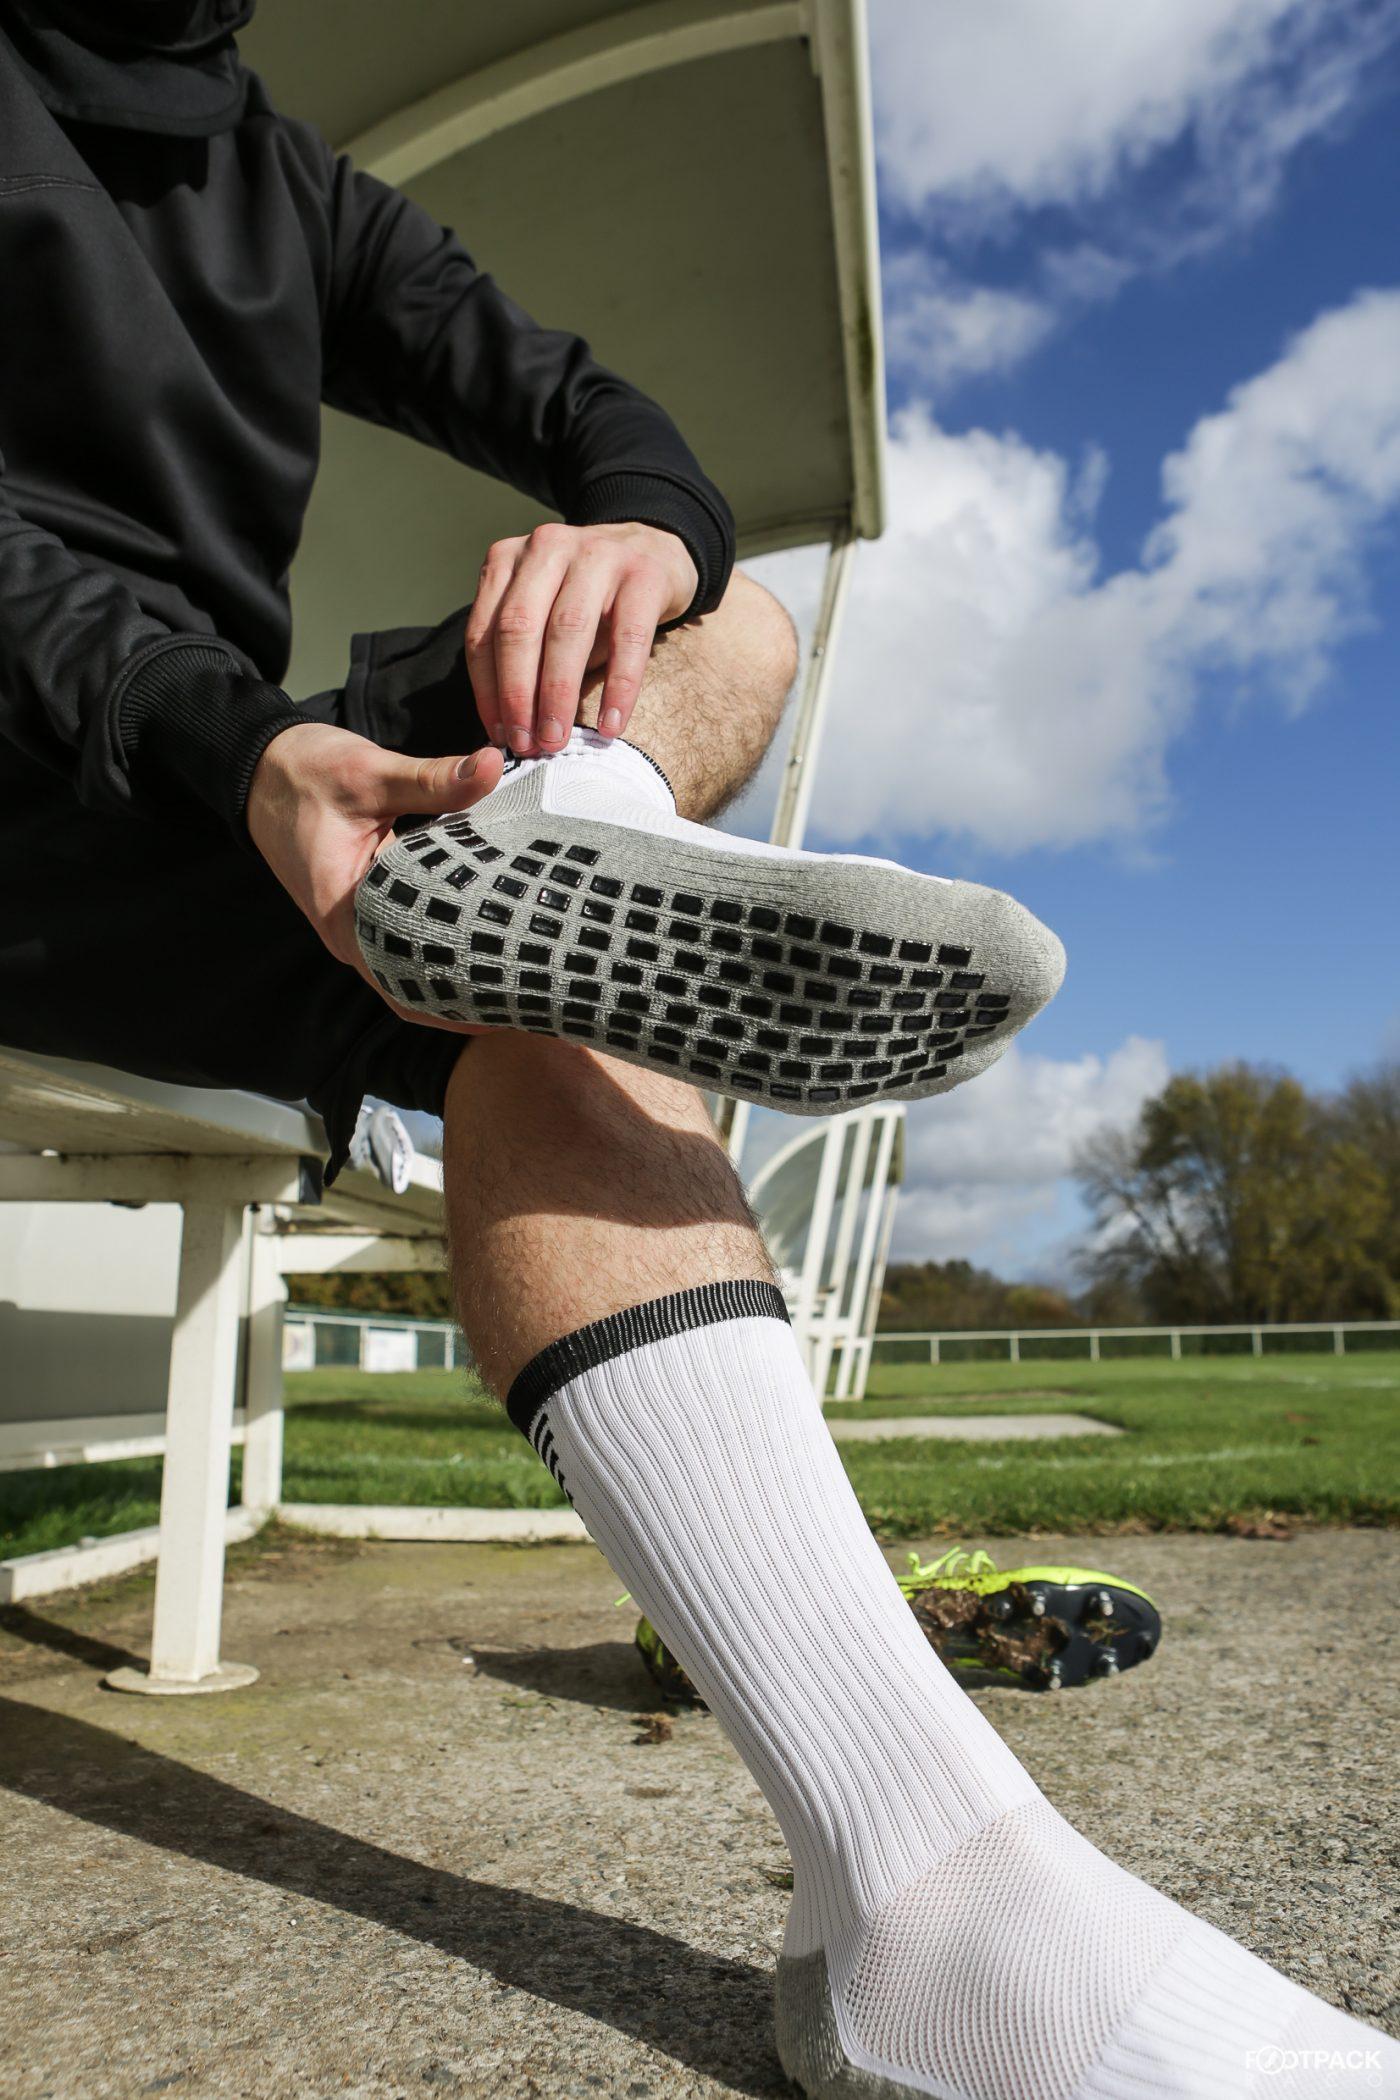 test-chaussettes-mc-protech-football-footpack6